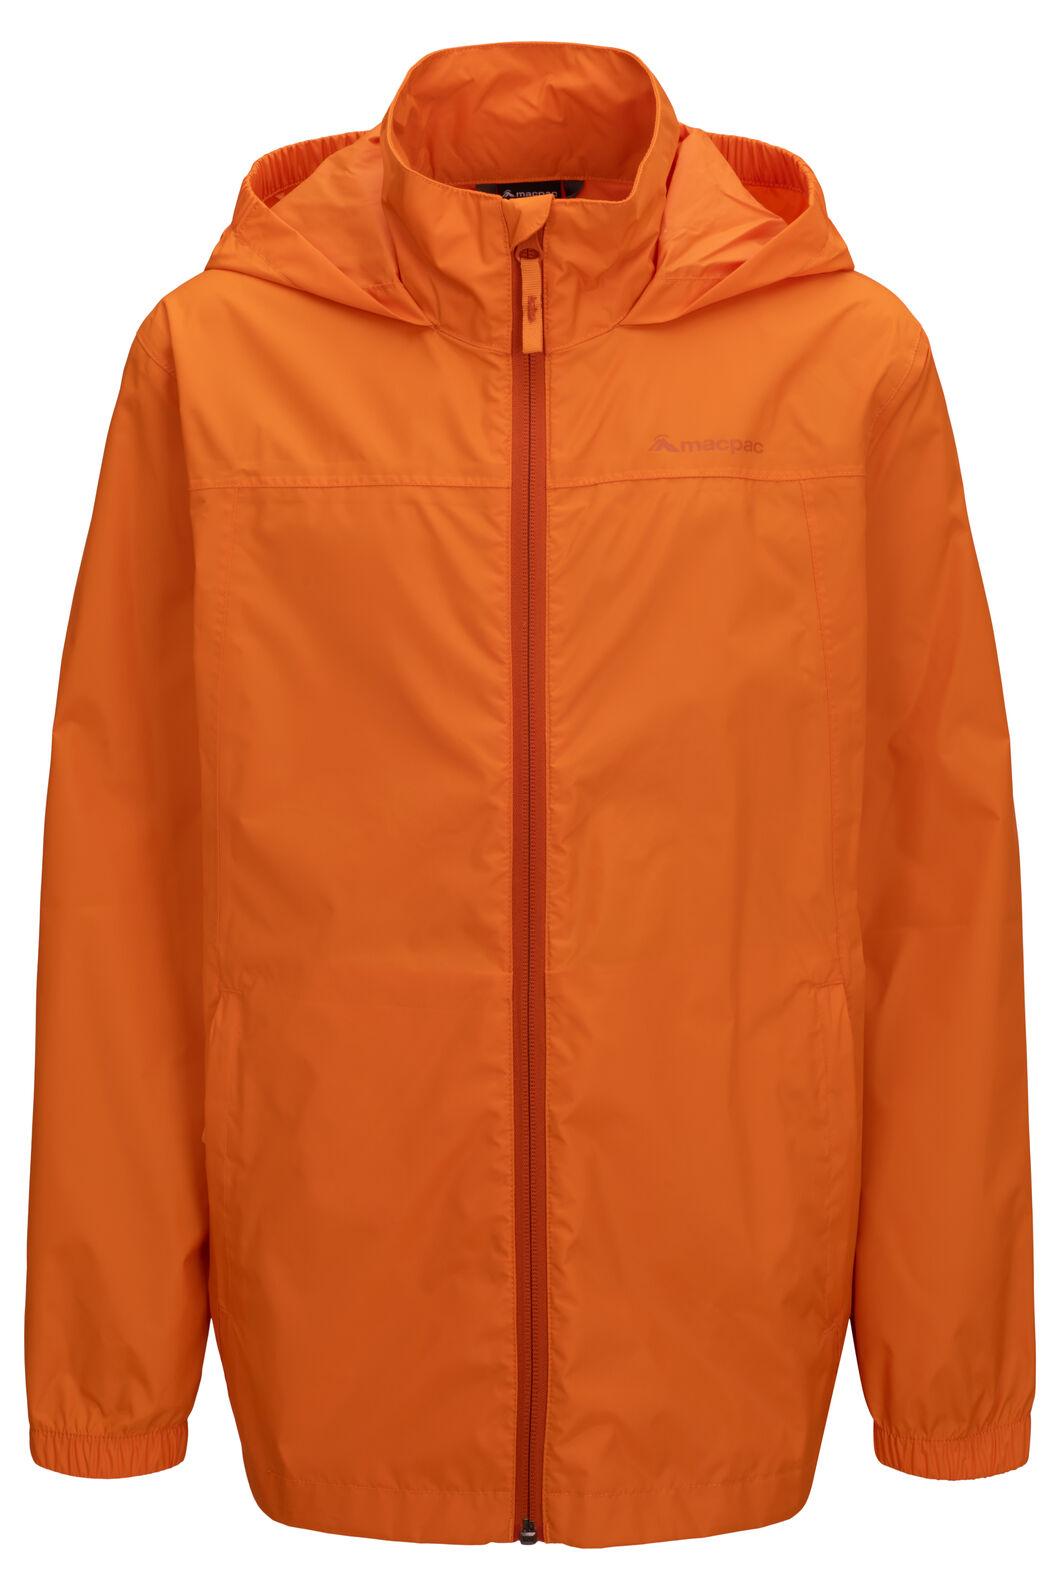 Macpac Pack-It-Jacket — Kids', Russet Orange, hi-res